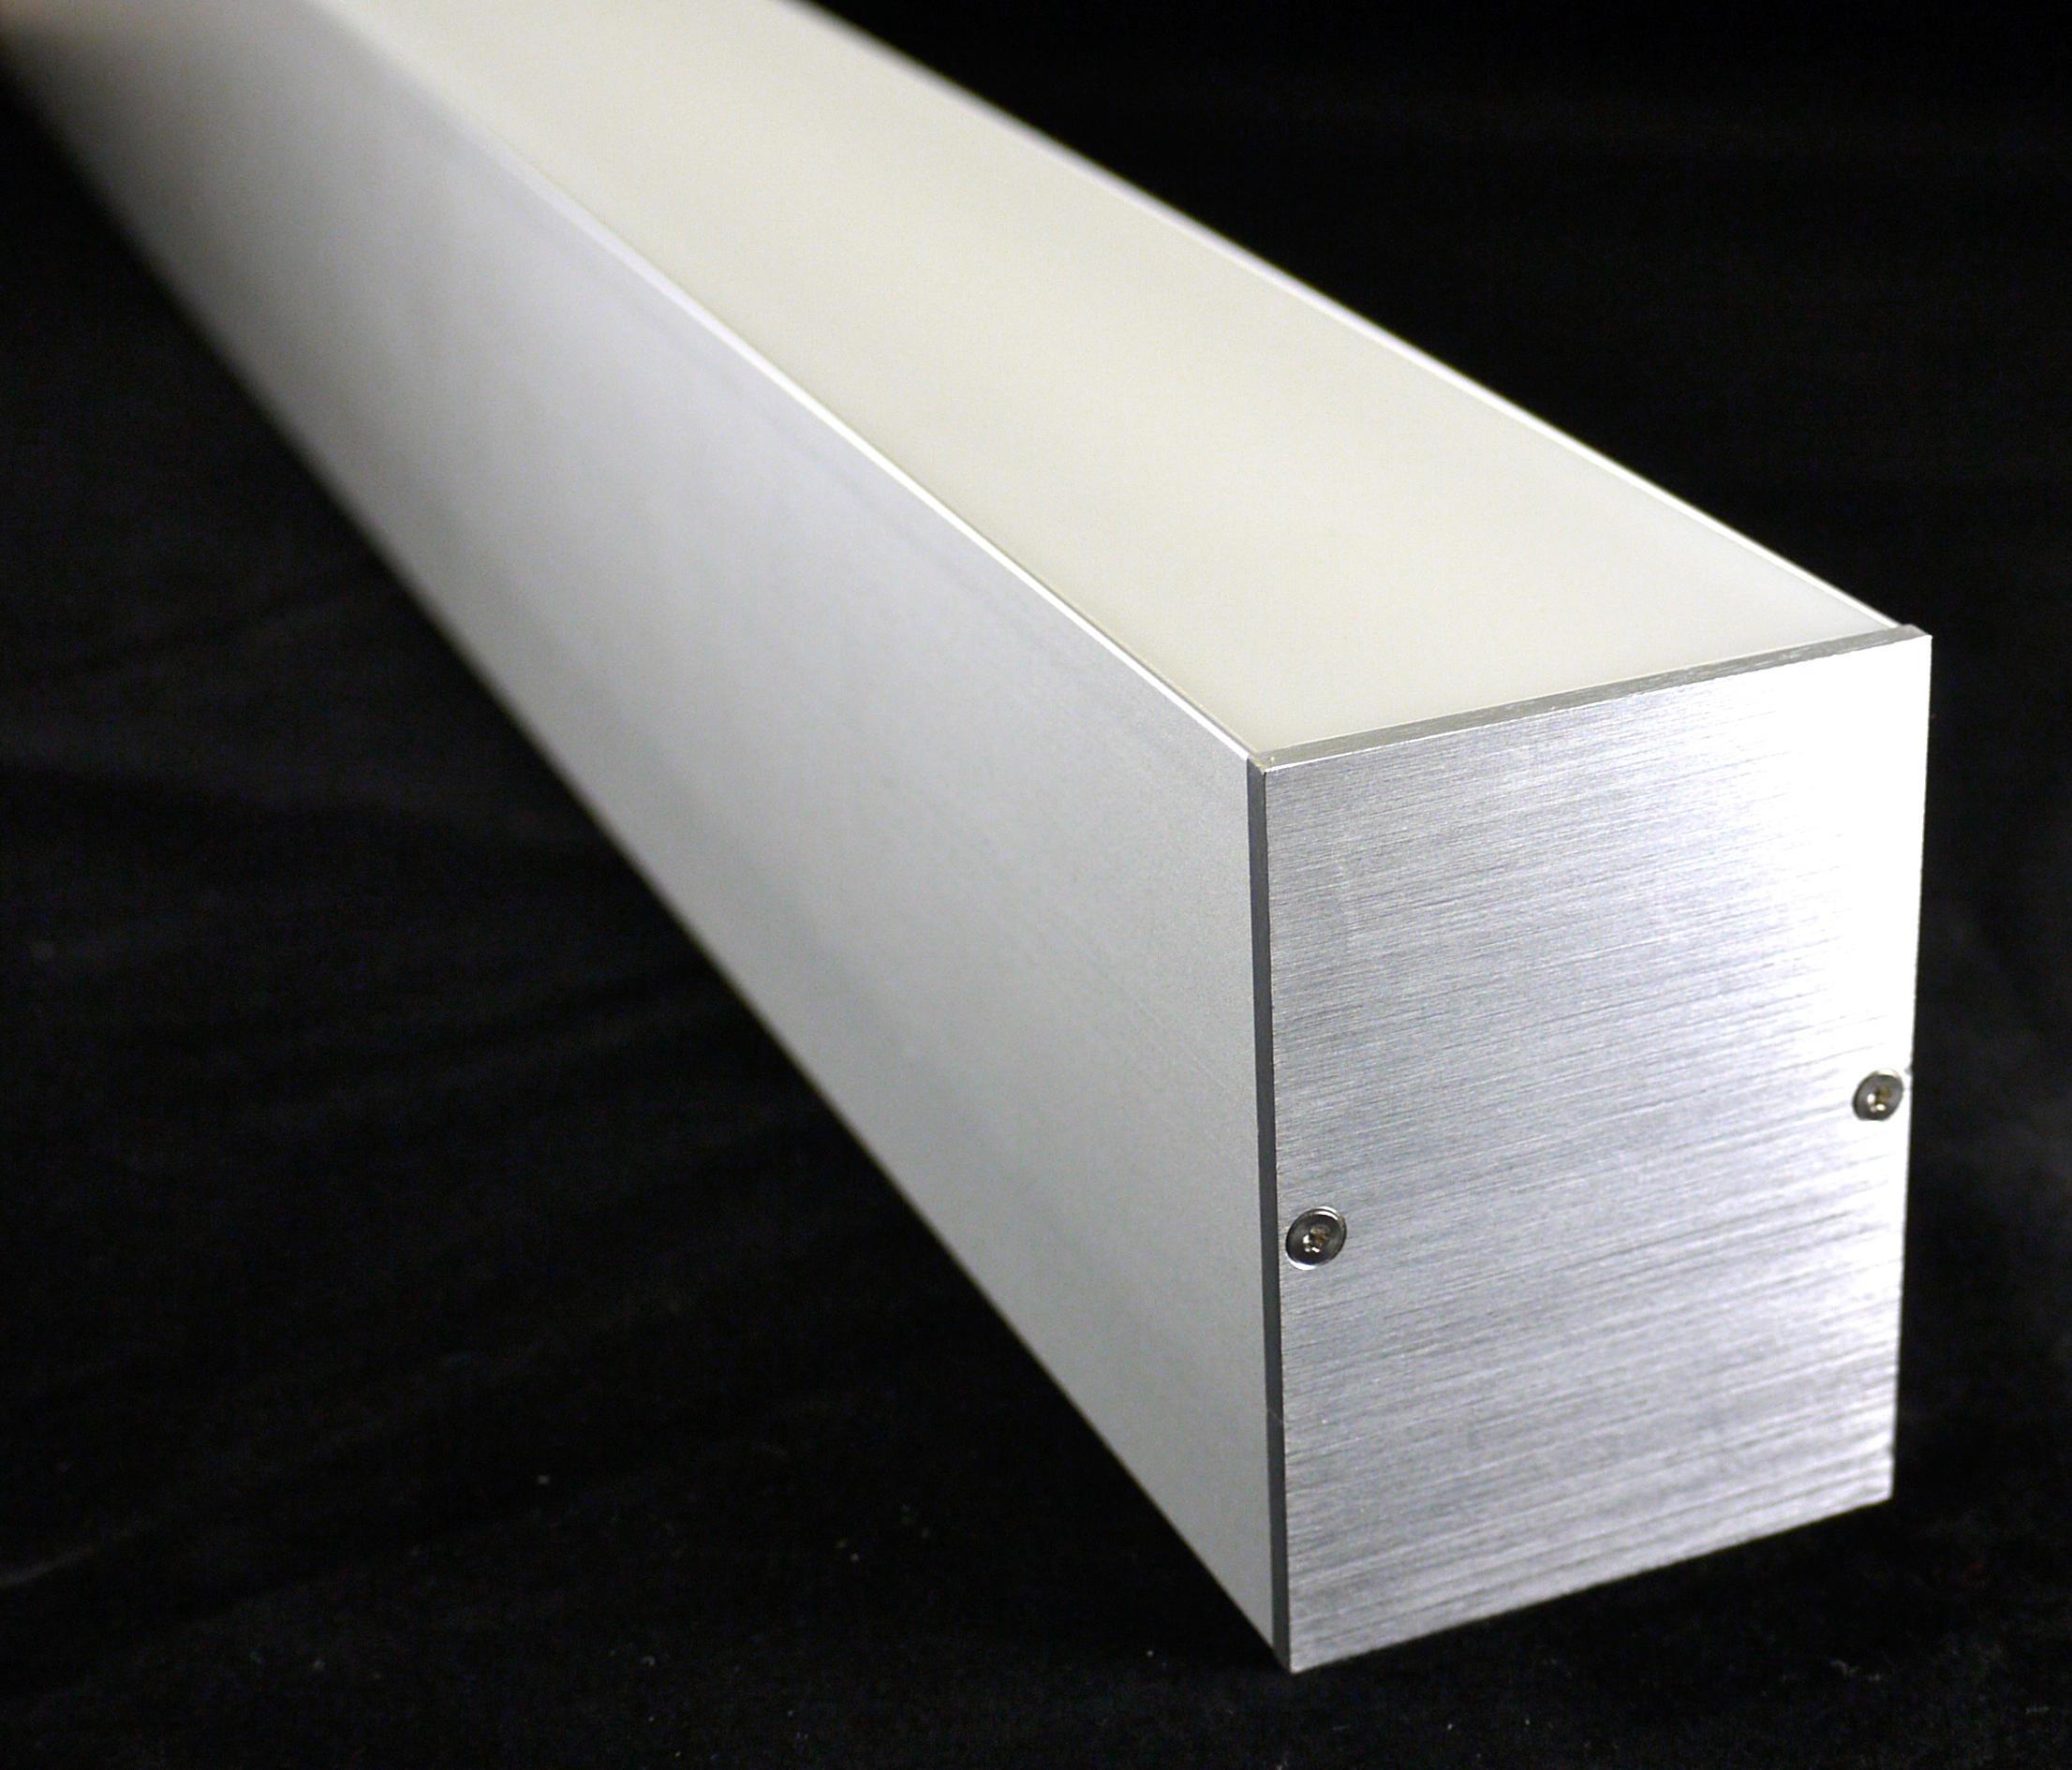 Led kanal mp 70 50 l mparas de suspensi n de richter for Koch 4 kanal led funkfernsteuerung